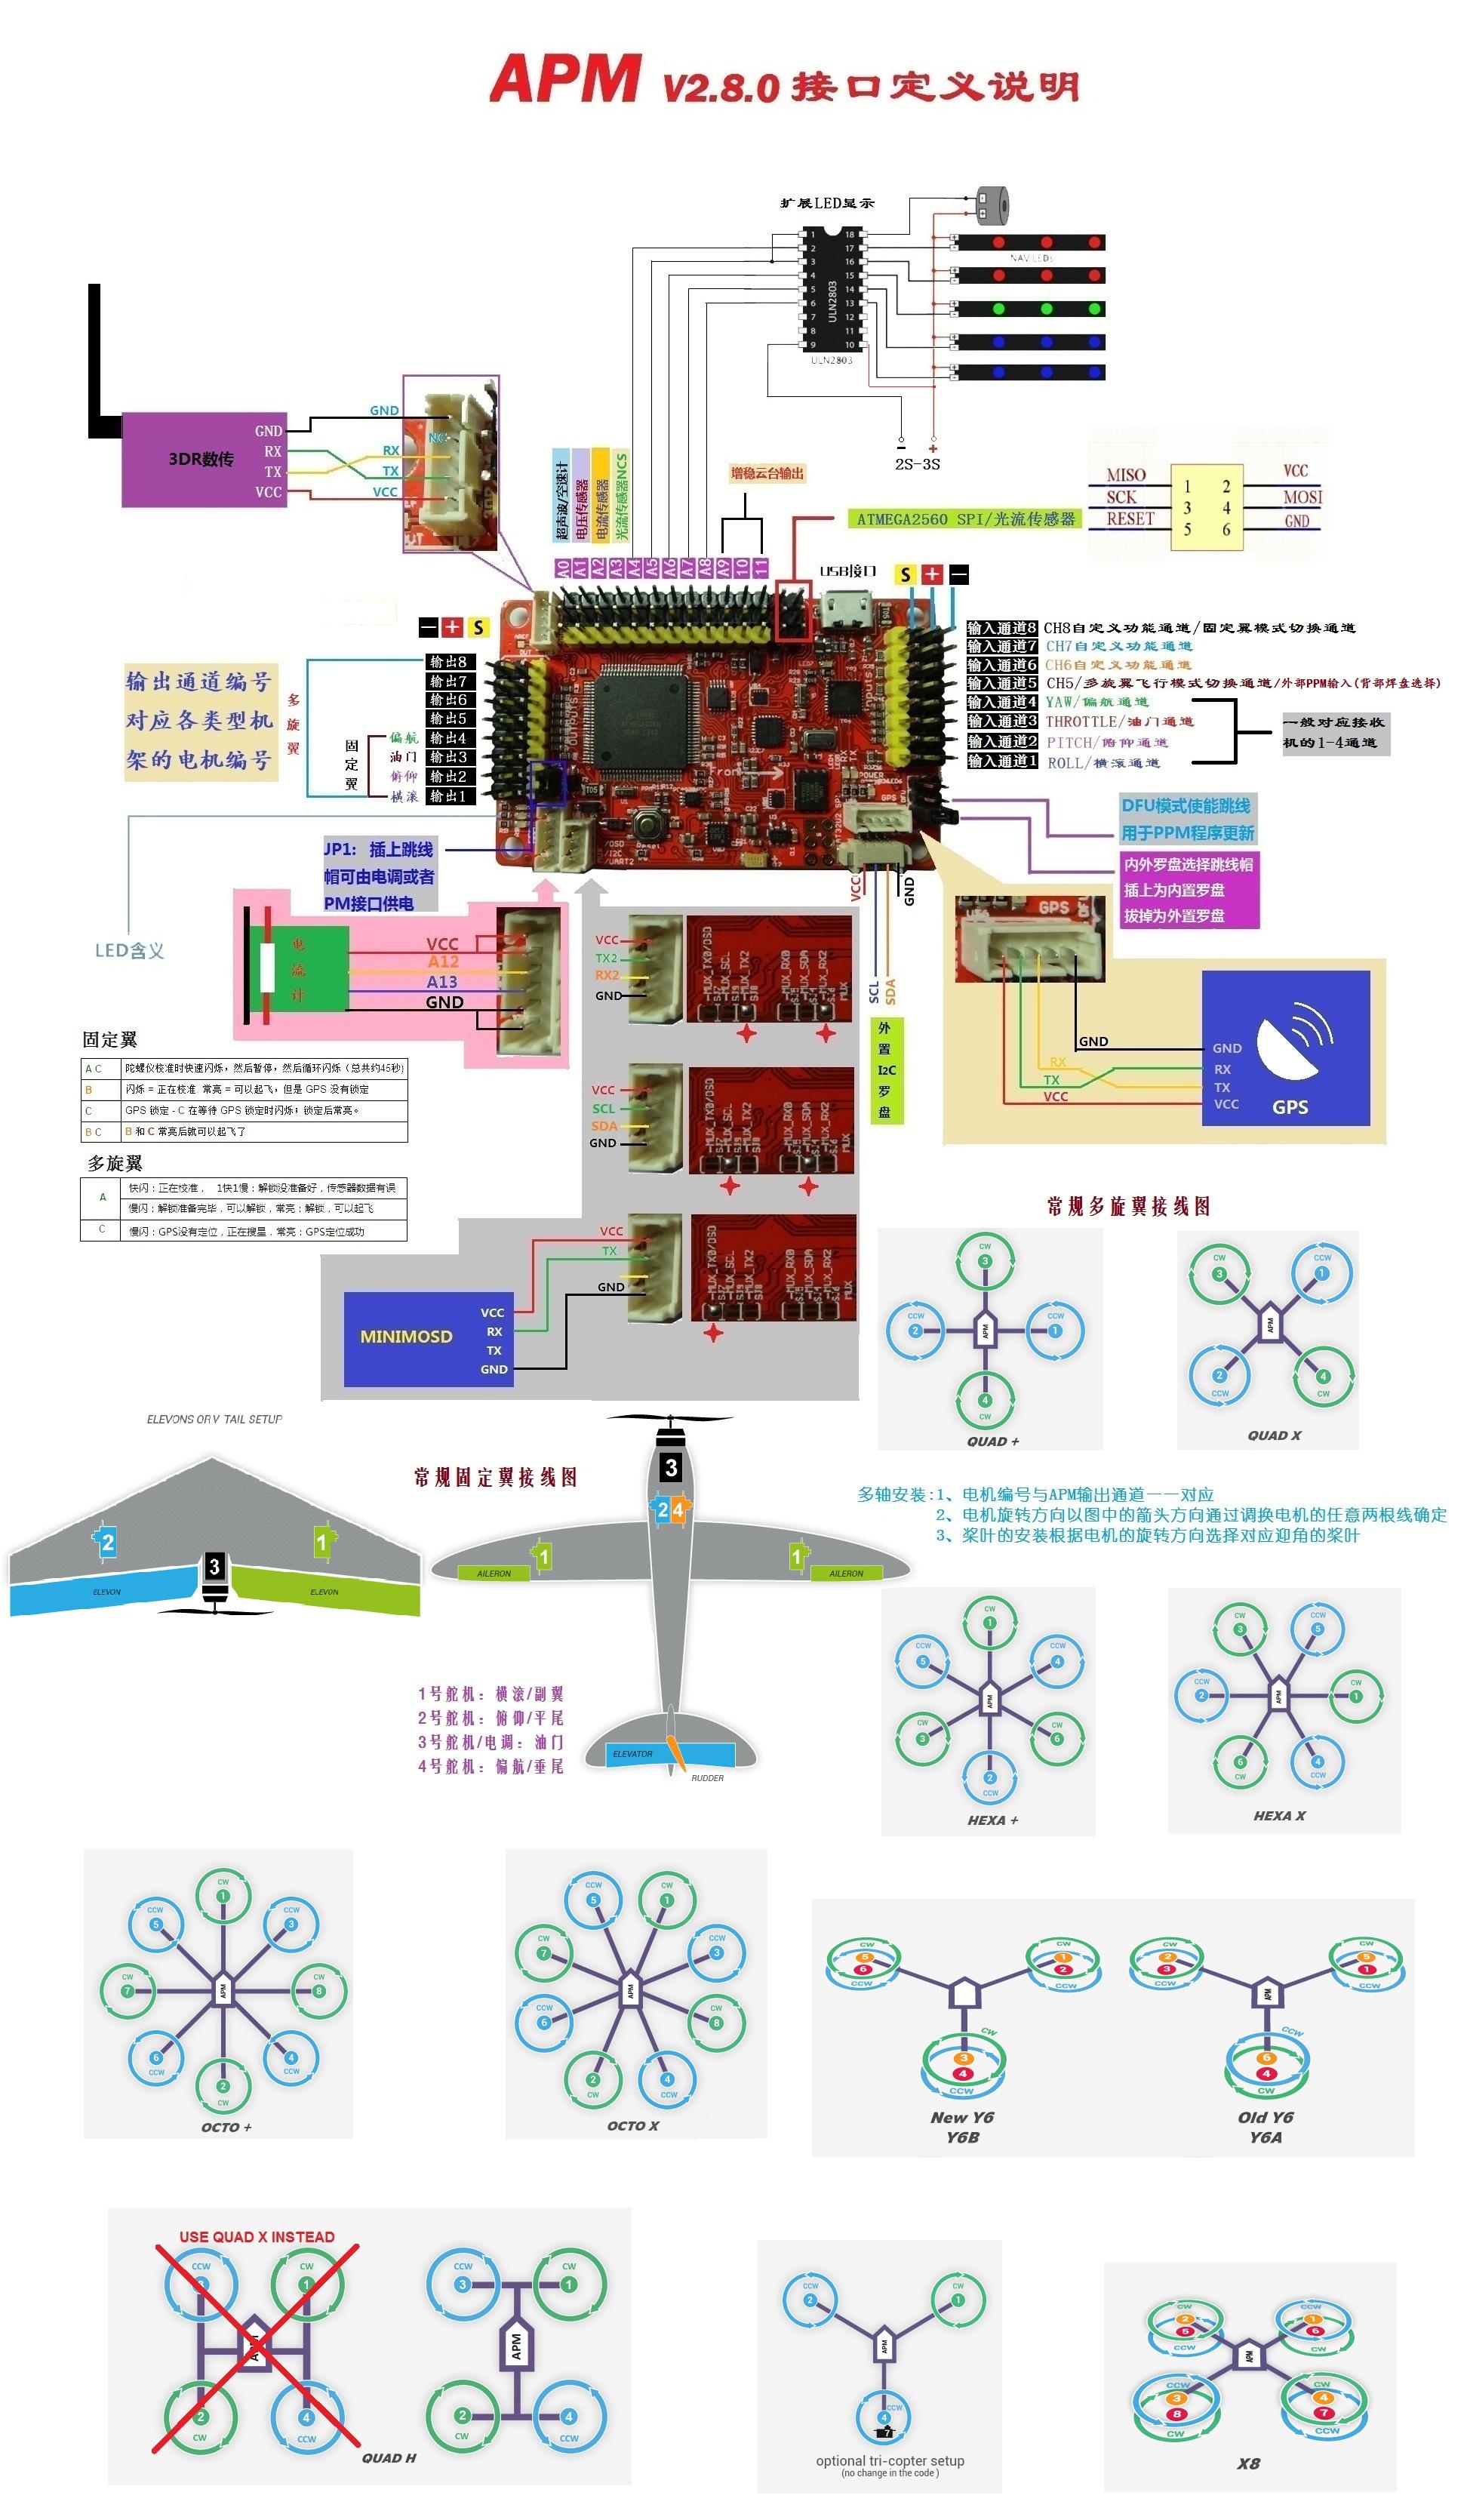 apm2 8 flight controller crius neo 7m gps module bracket. Black Bedroom Furniture Sets. Home Design Ideas